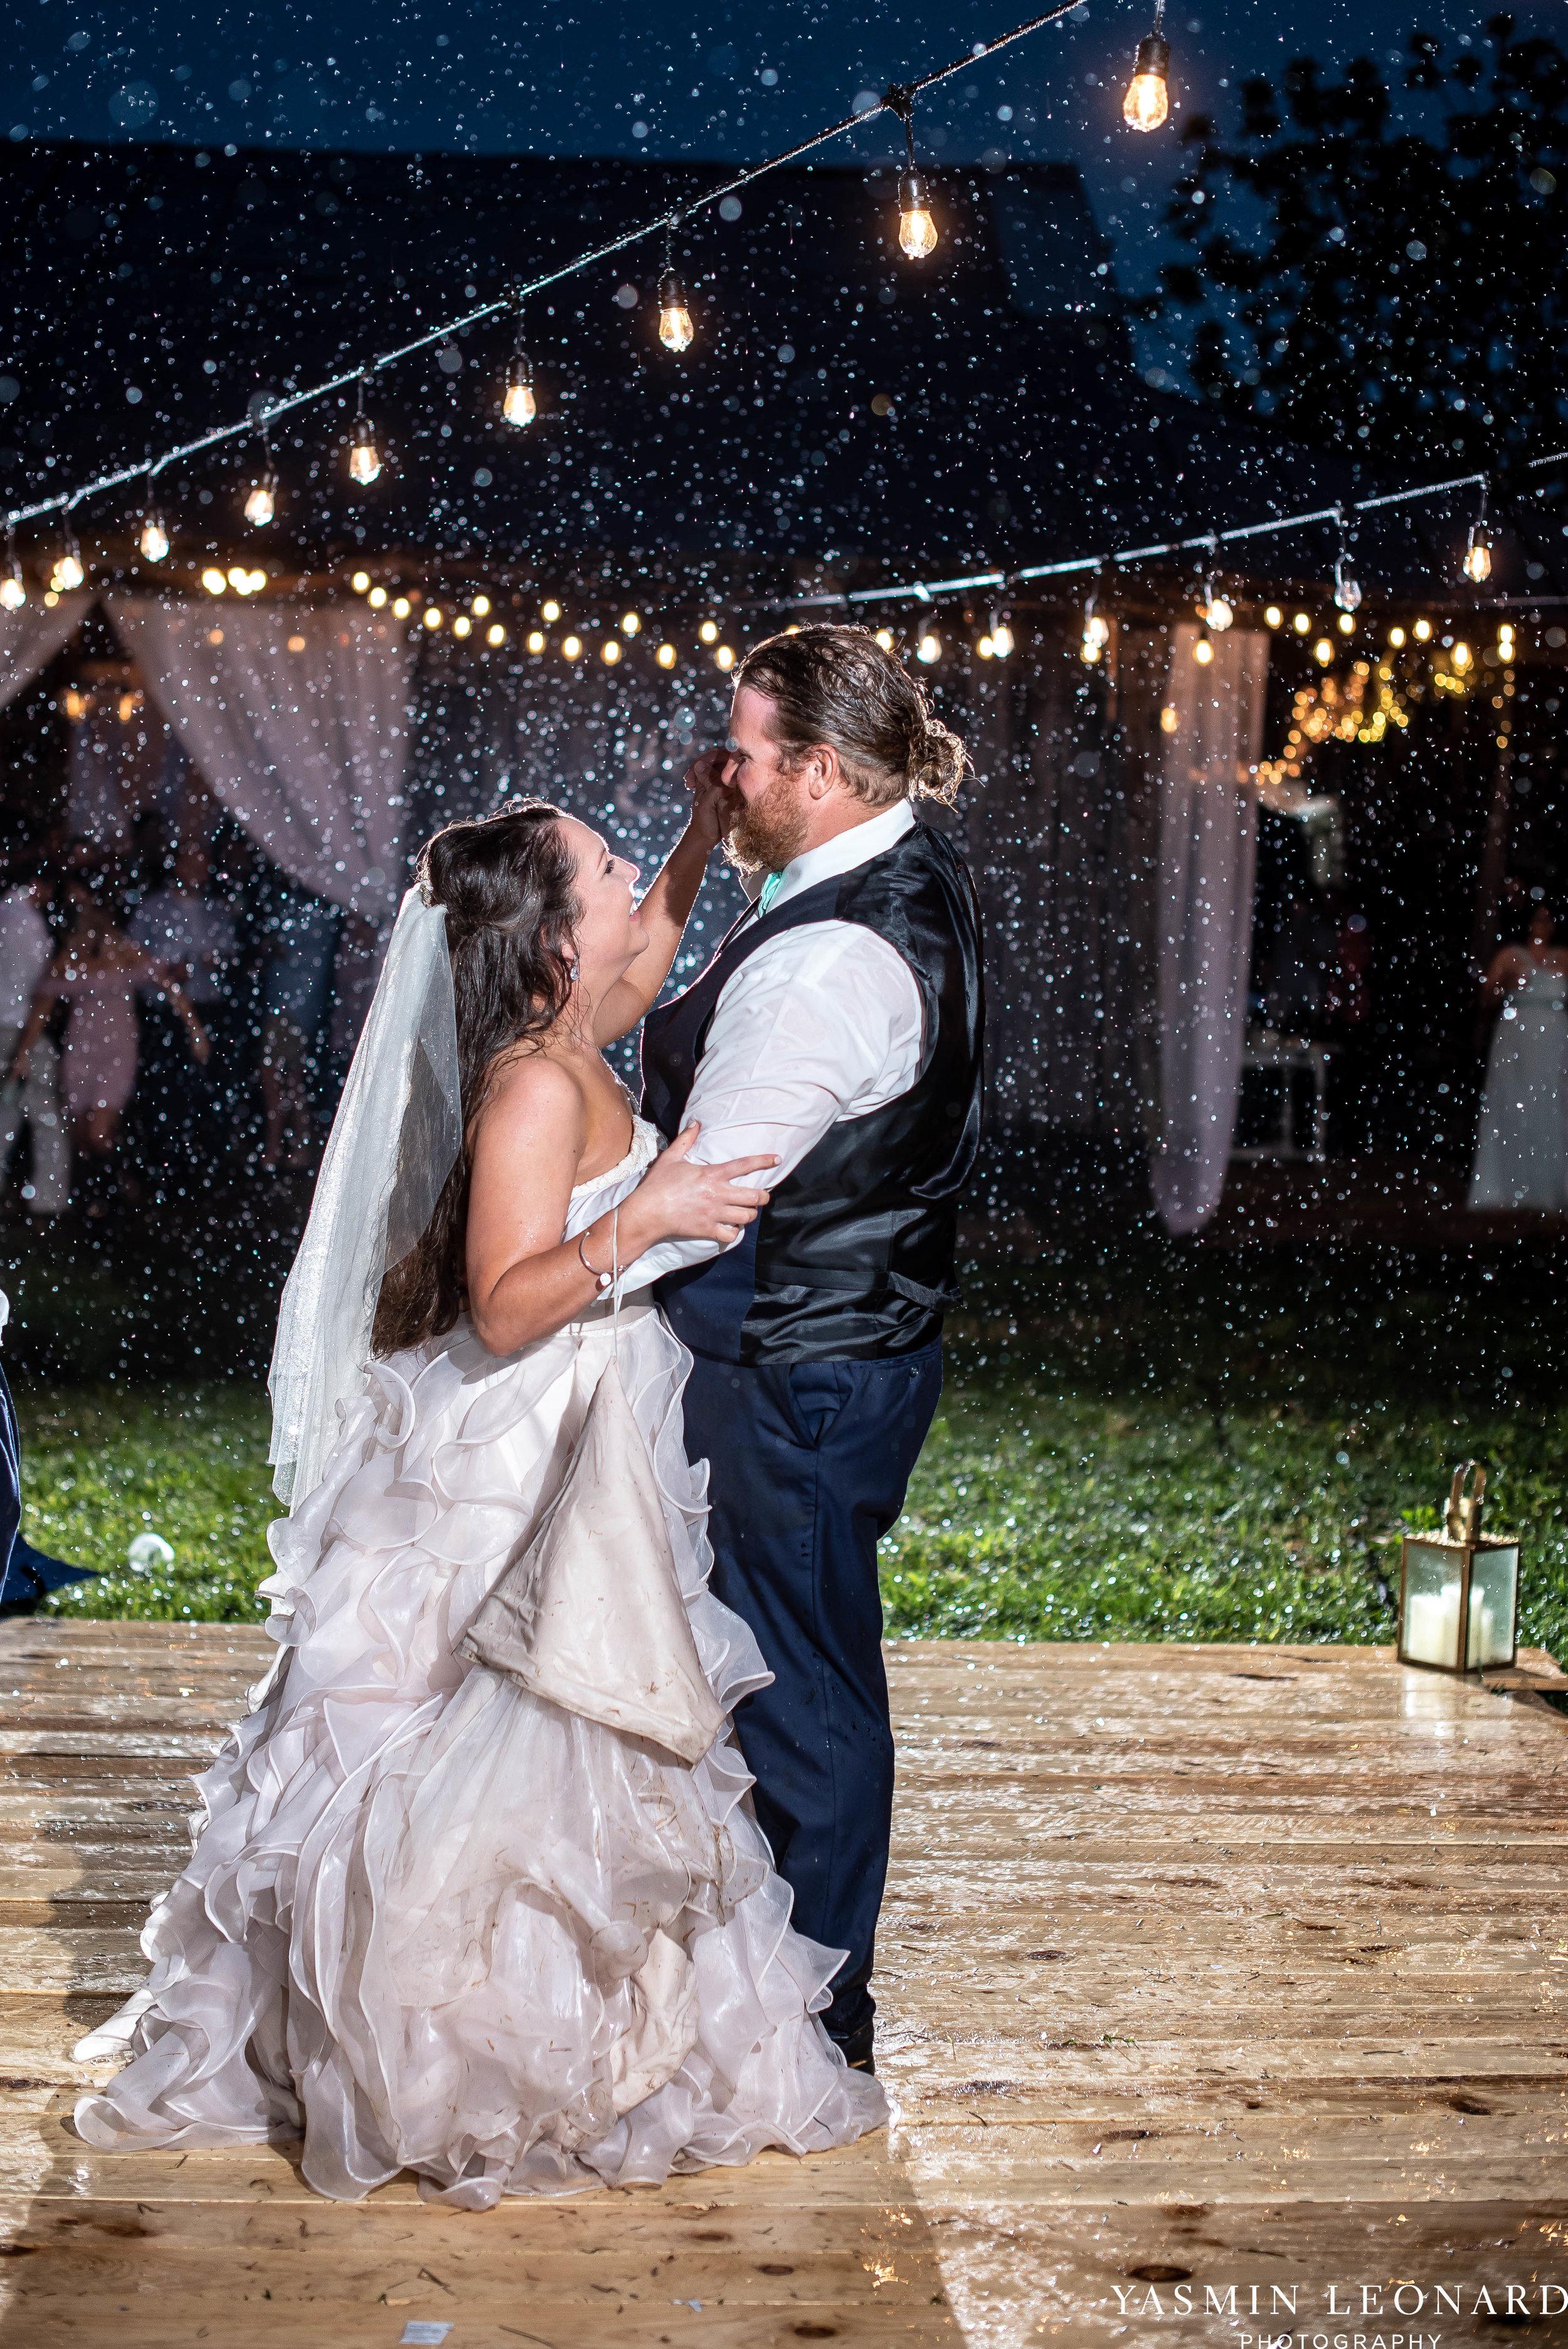 Rain on your wedding day - Rainy Wedding - Plan B for Rain - What to do if it rains on your wedding day - Wedding Inspiration - Outdoor wedding ideas - Rainy Wedding Pictures - Yasmin Leonard Photography-82.jpg